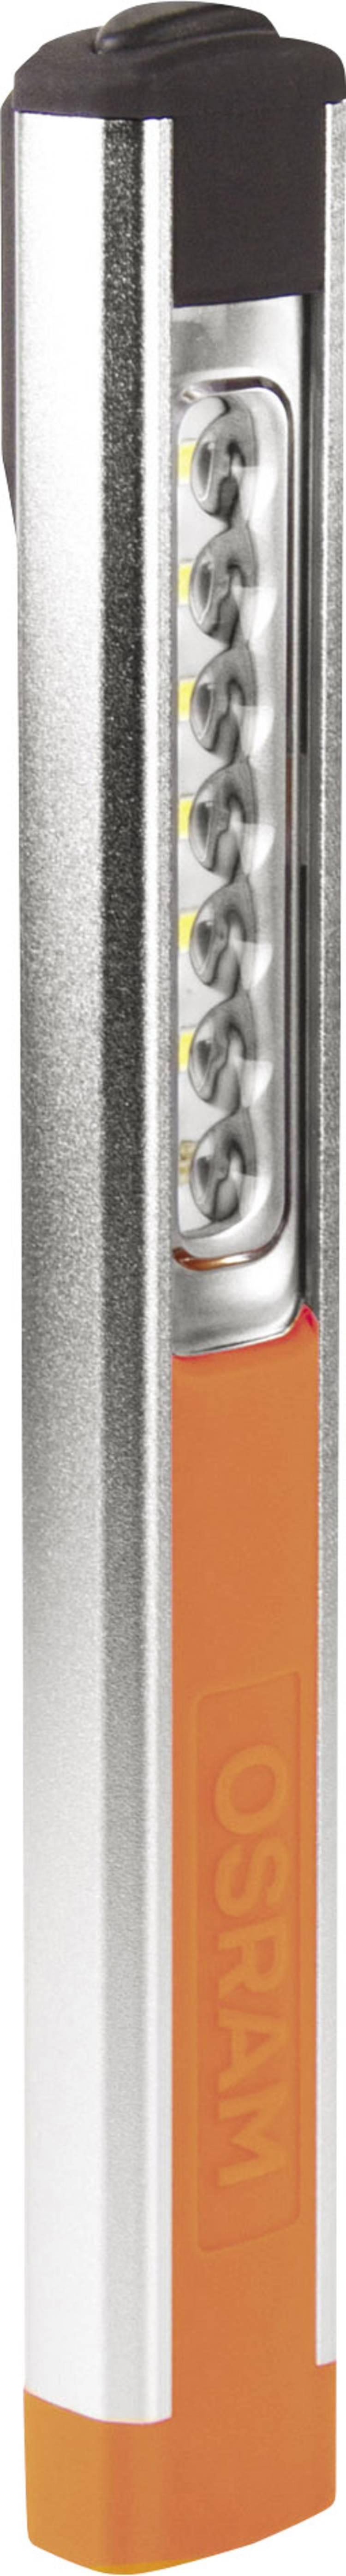 LED Penlightlamp werkt op een accu OSRAM LEDIL105 LEDinspect PRO Penlight 150 150 lm